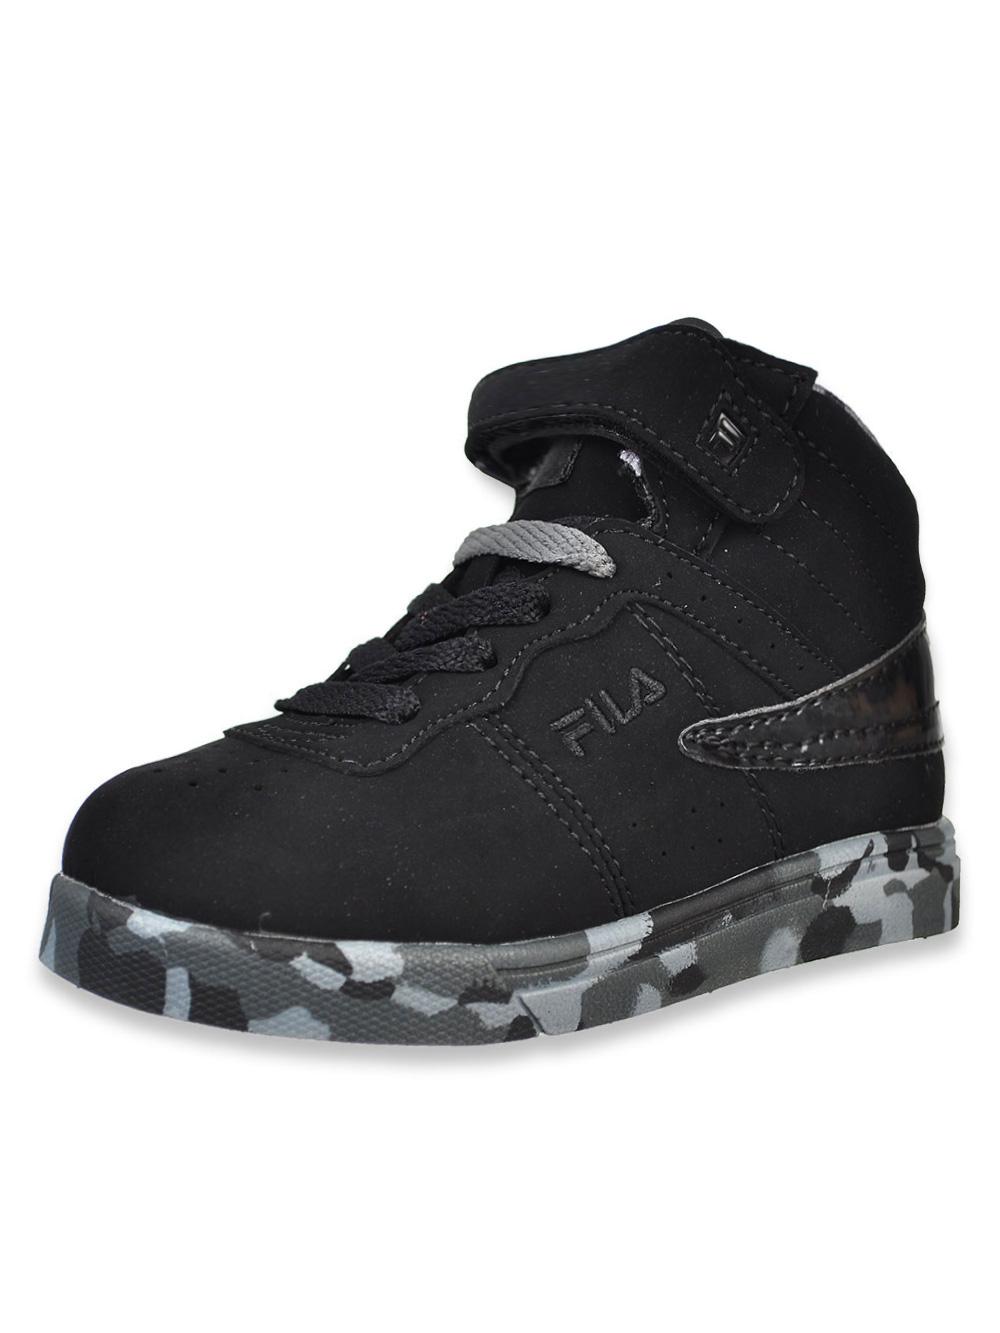 65989e57398 Fila Boys  Vulc 13 Mashup Hi-Top Sneakers (Sizes 6 – 10)